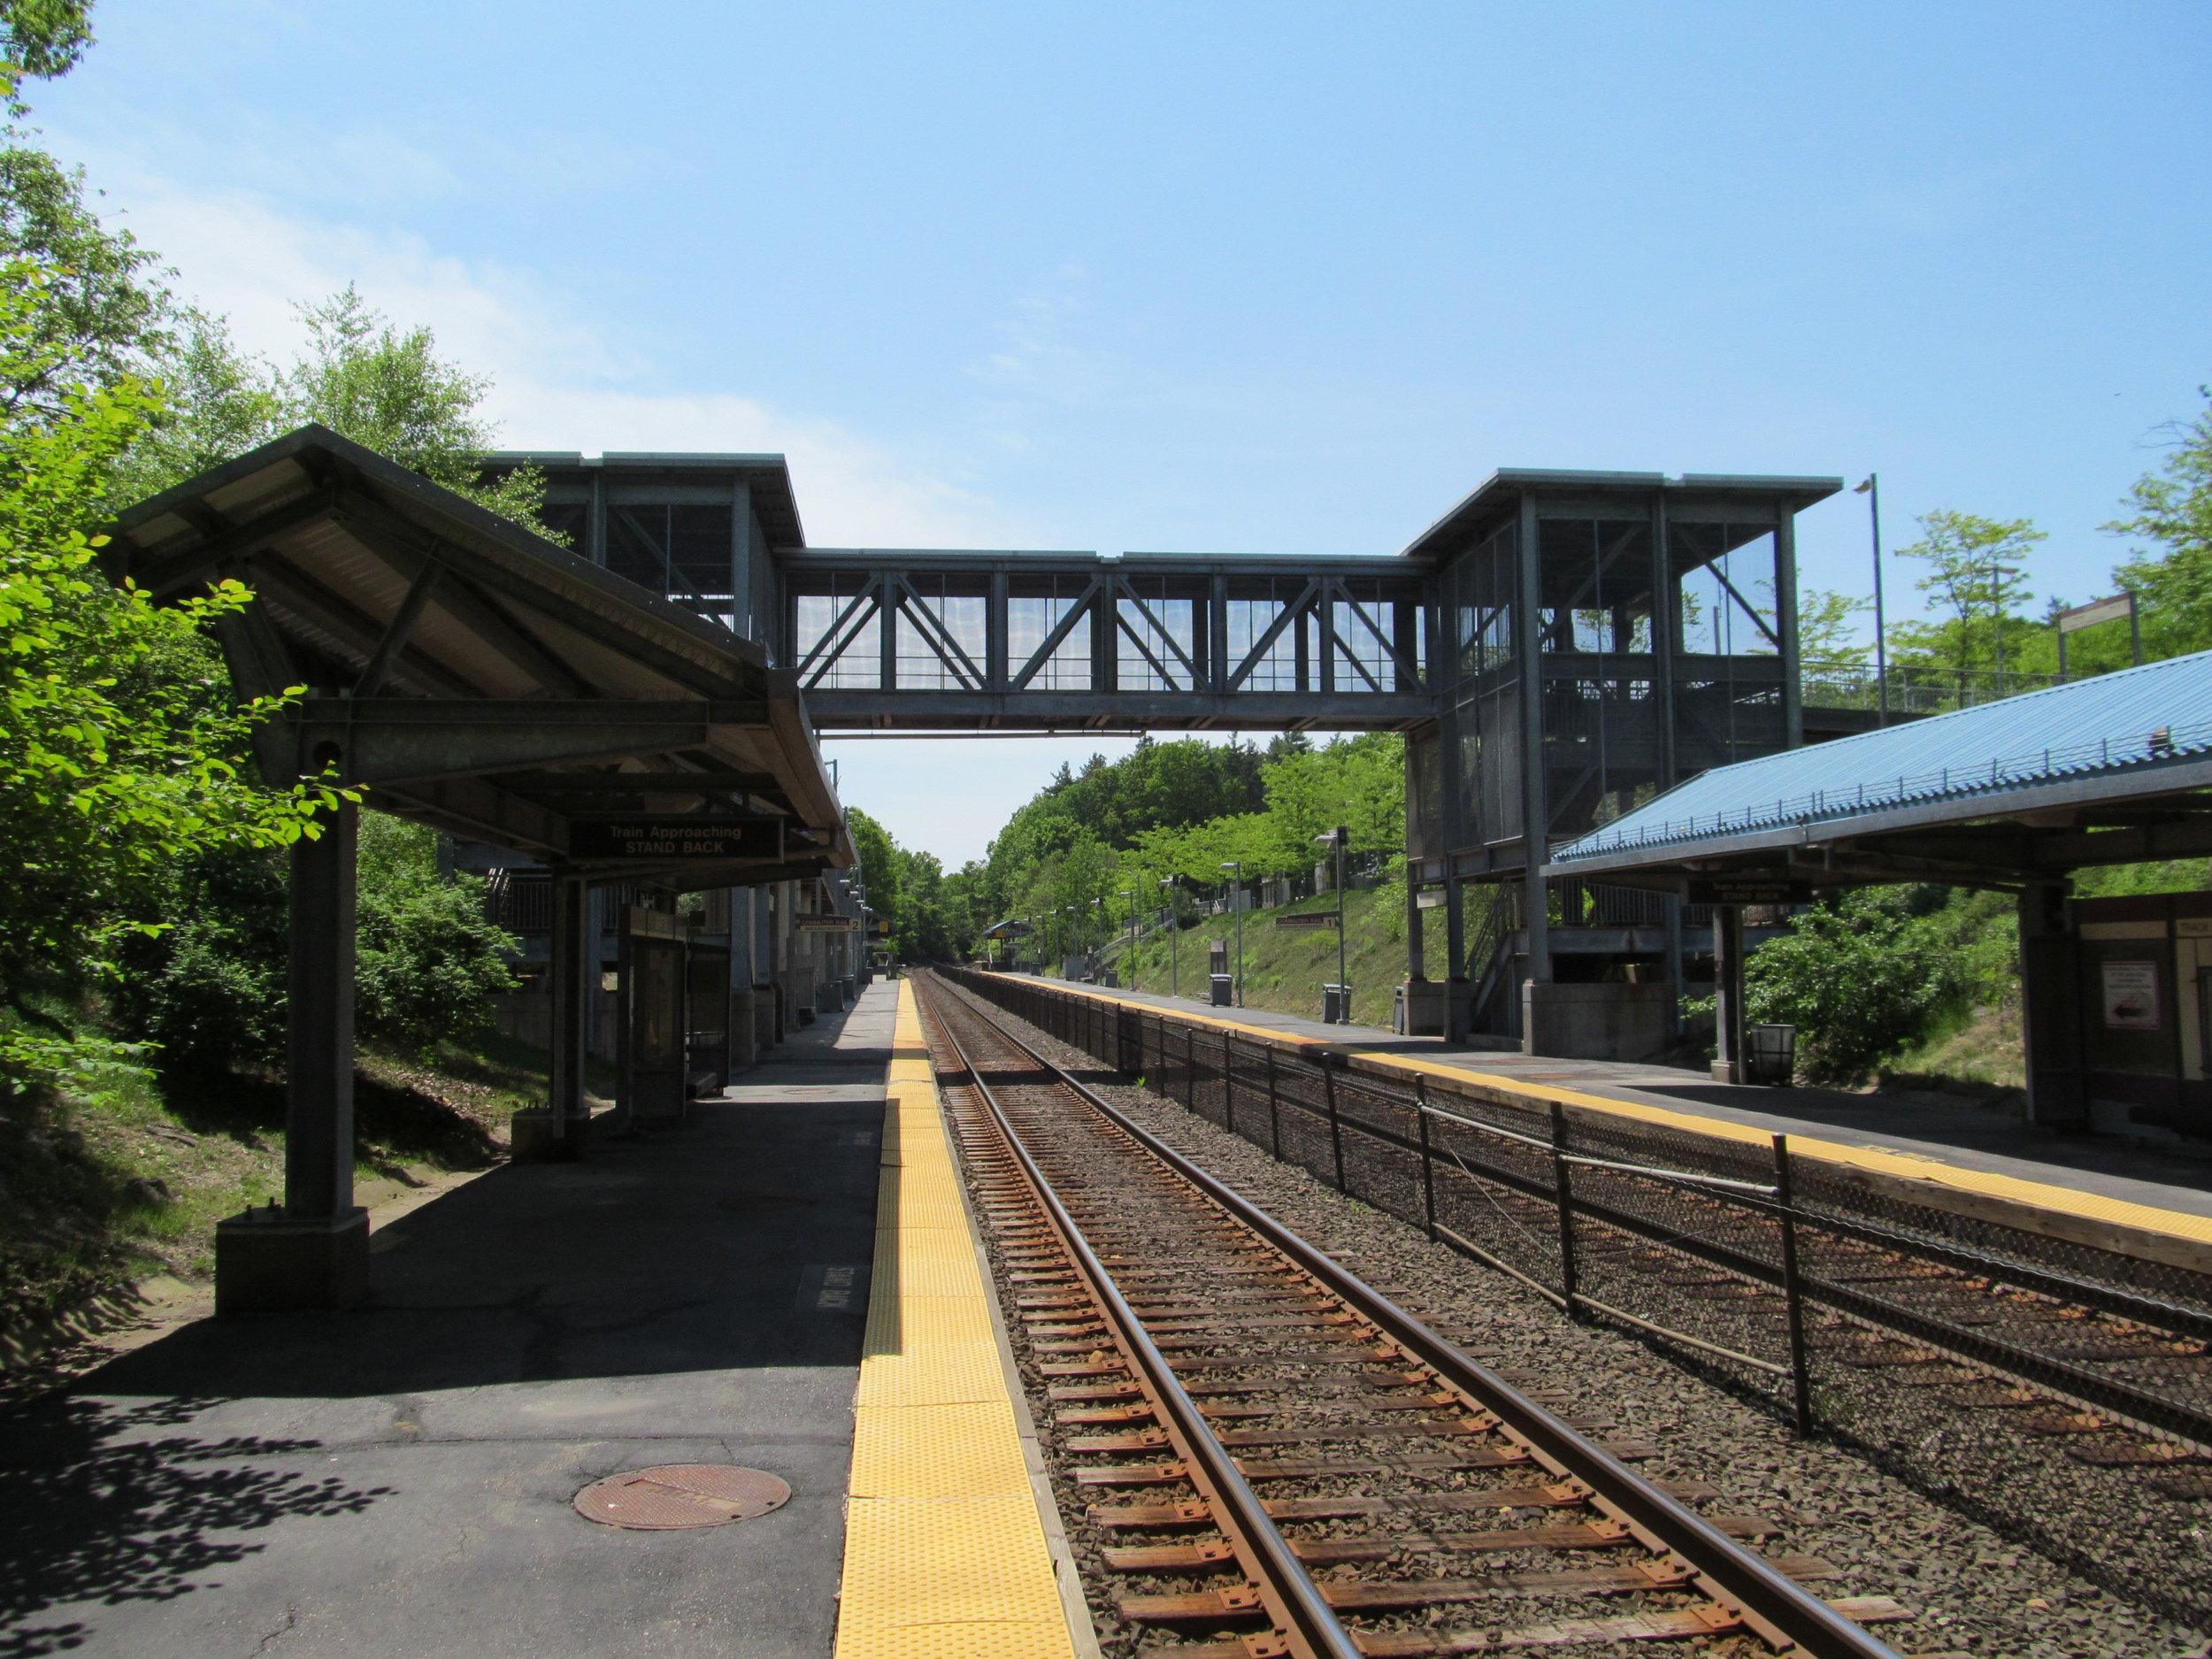 Grafton_MBTA_station,_Outbound,_North_Grafton_MA.jpg